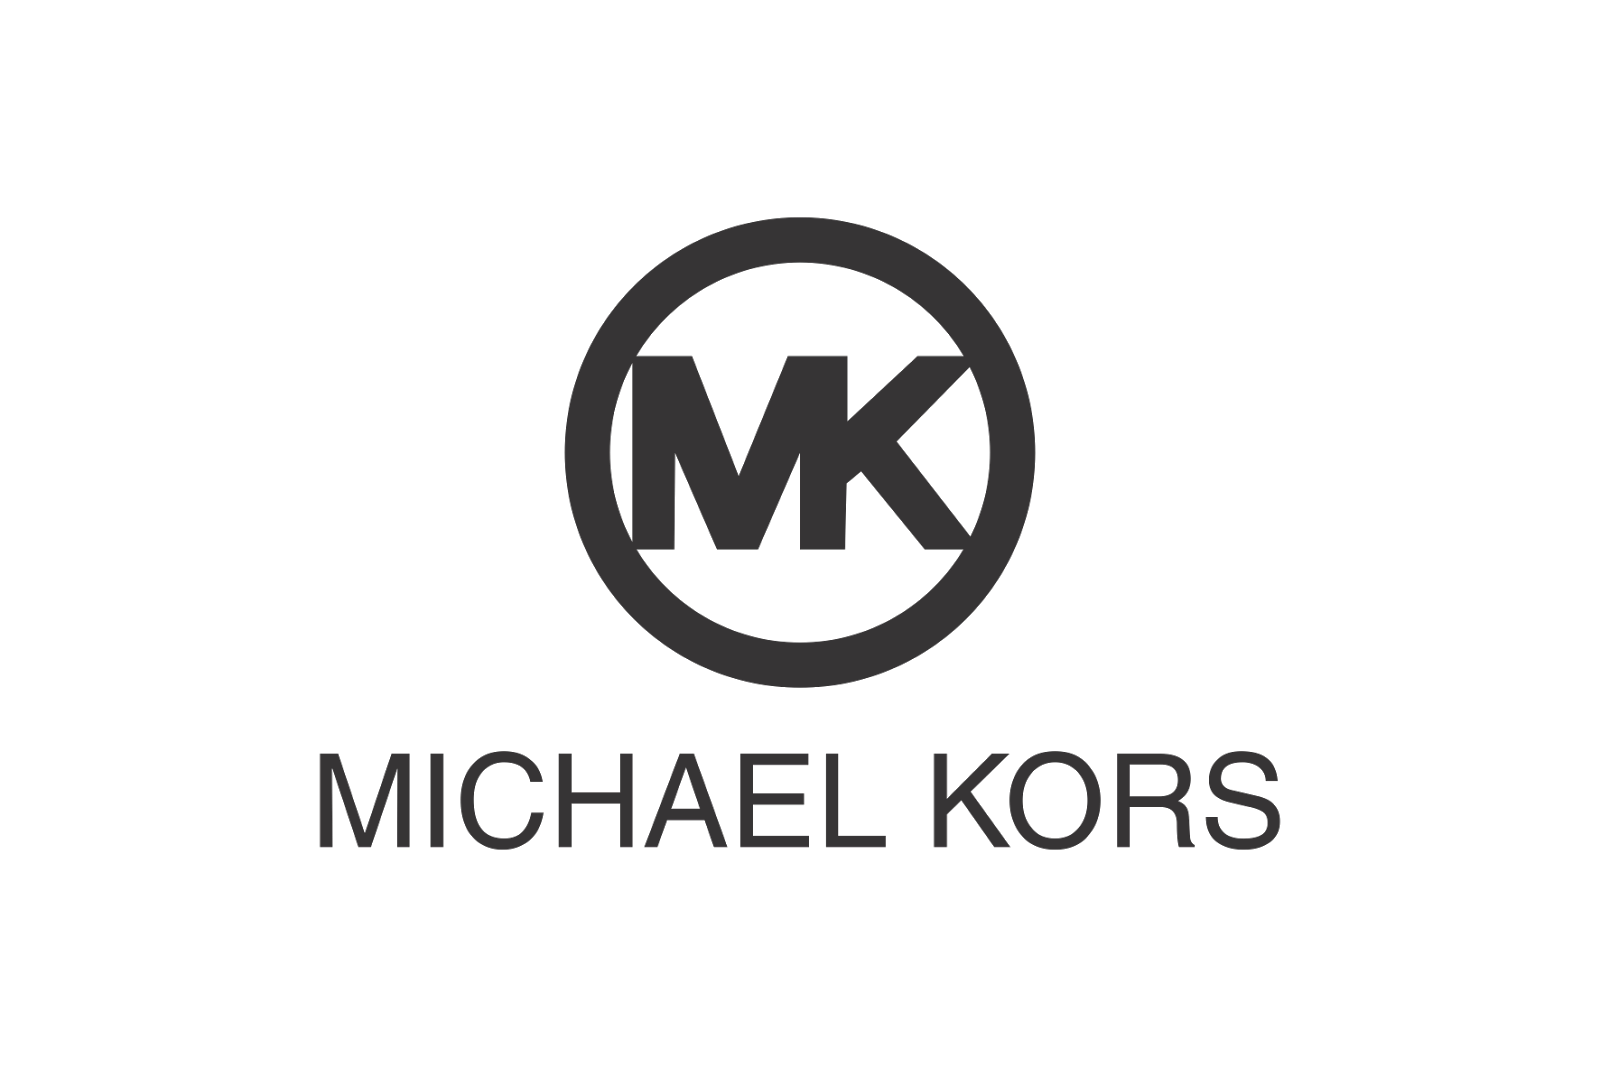 История бренда Michael Kors